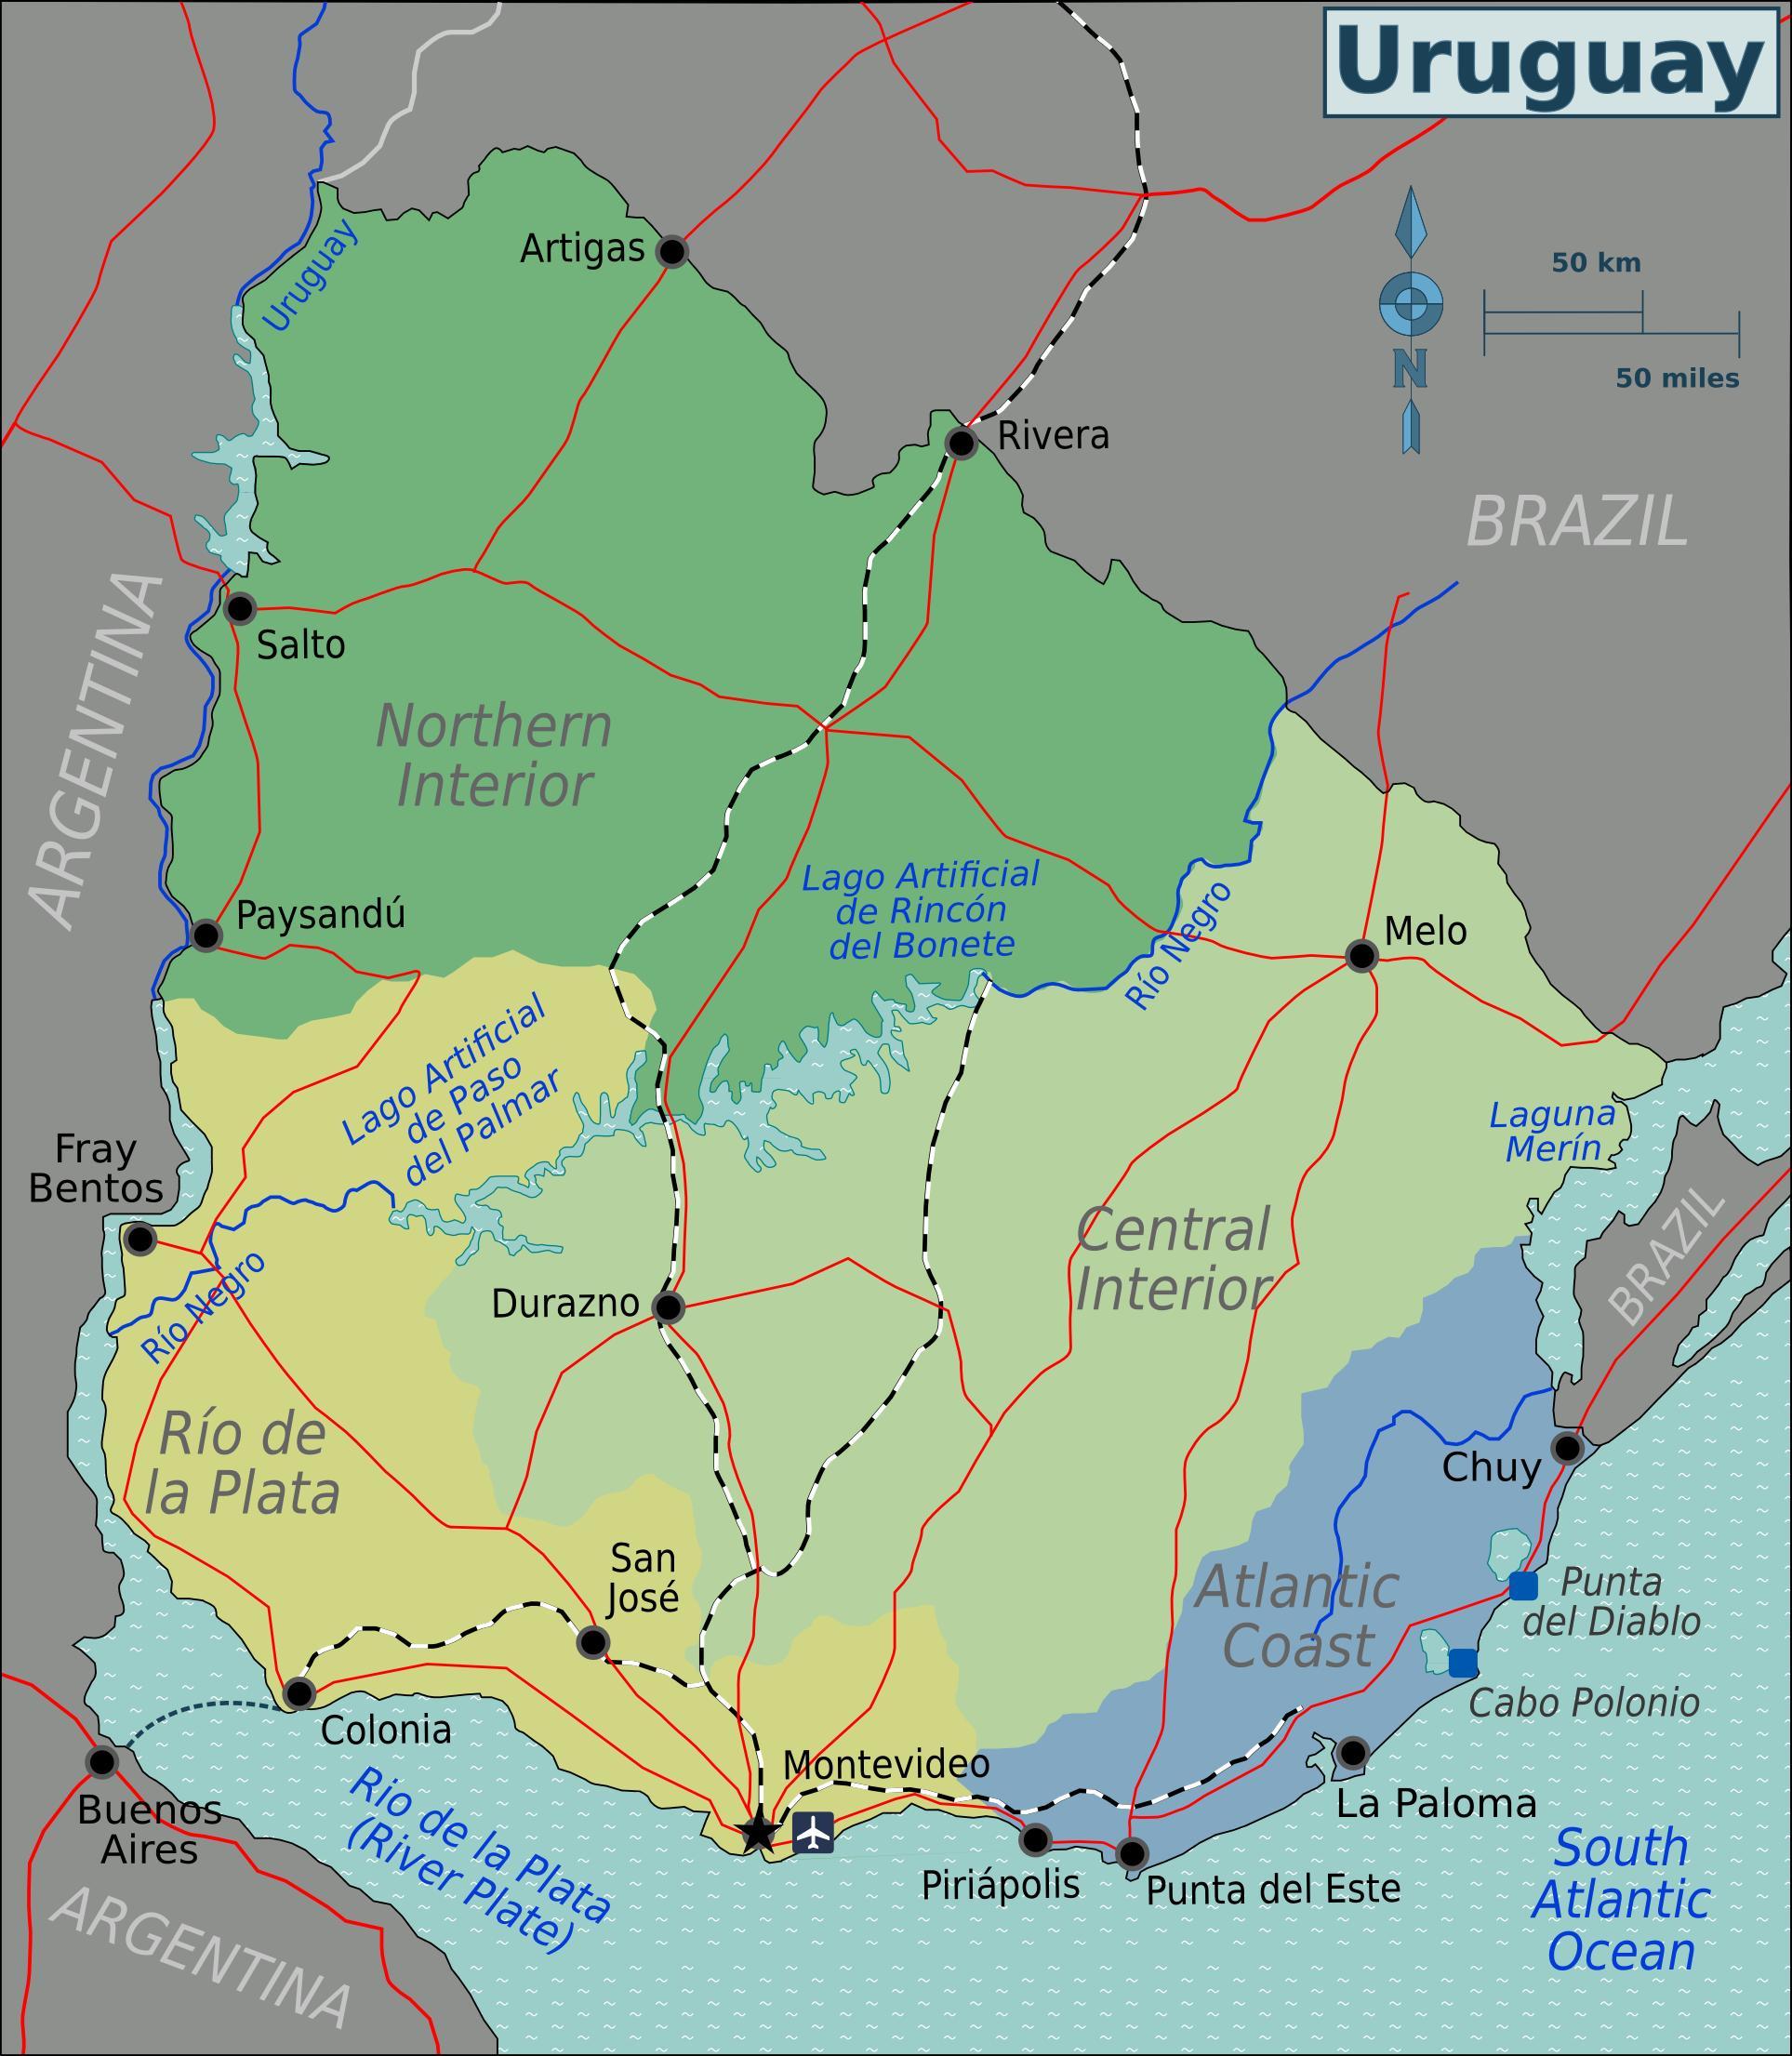 uruguay landkarte Landkarte Uruguay (Übersichtskarte/Regionen) : Weltkarte. uruguay landkarte